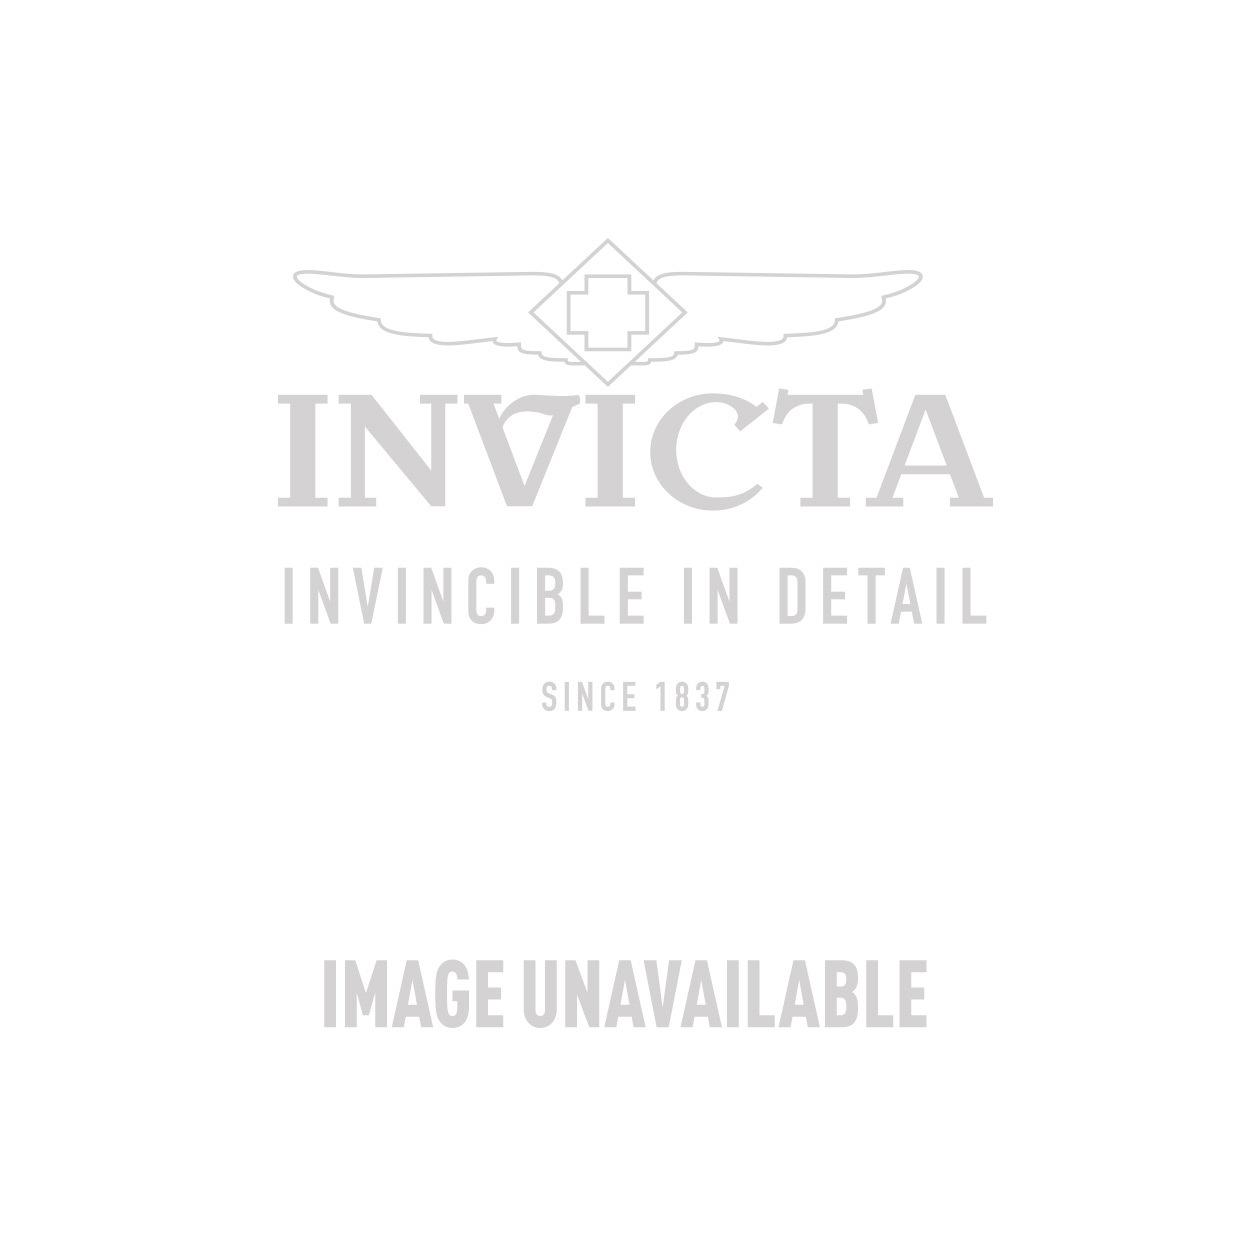 Invicta Lupah Women's Quartz 29mm Stainless Steel Case White Dial - Model 5168